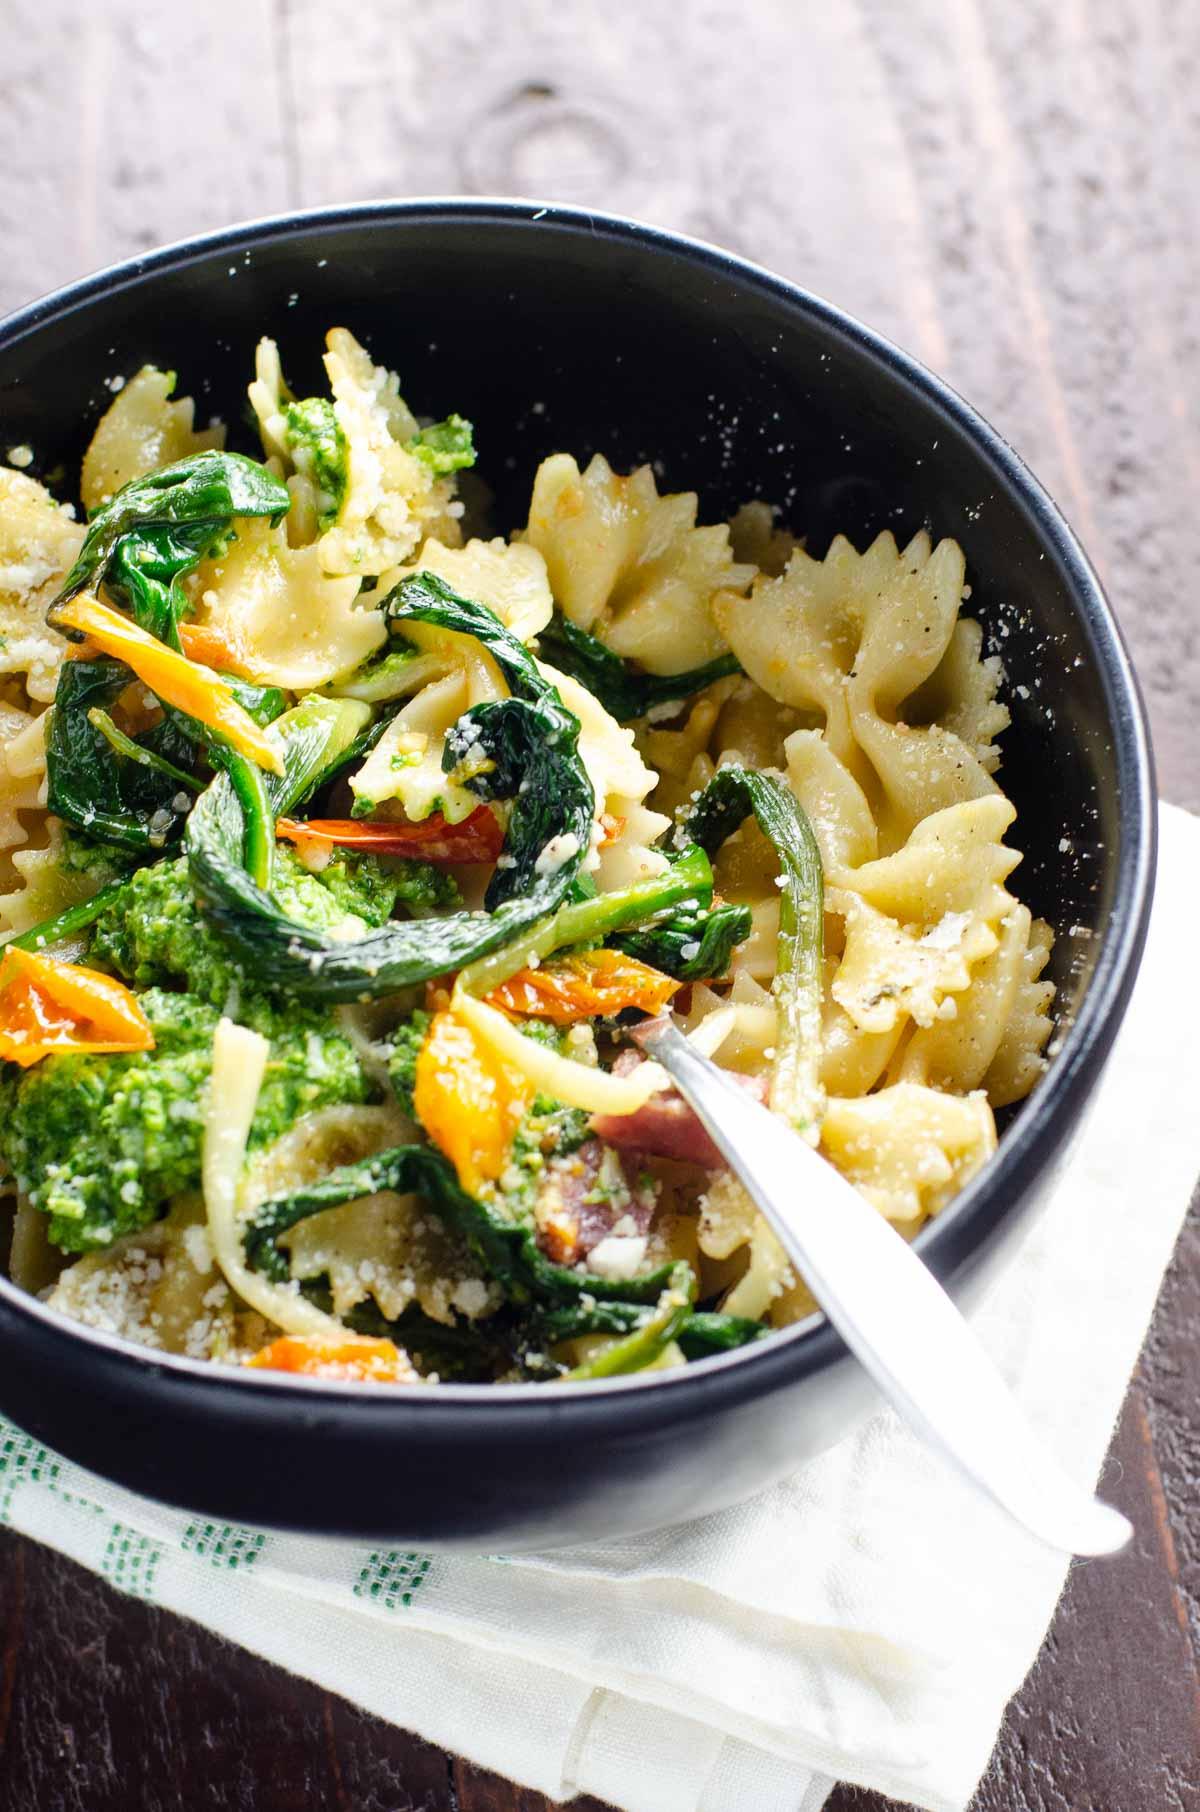 farfalle pasta with ramps, ramp pesto, cherry tomatoes, and soppressata in a black bowl